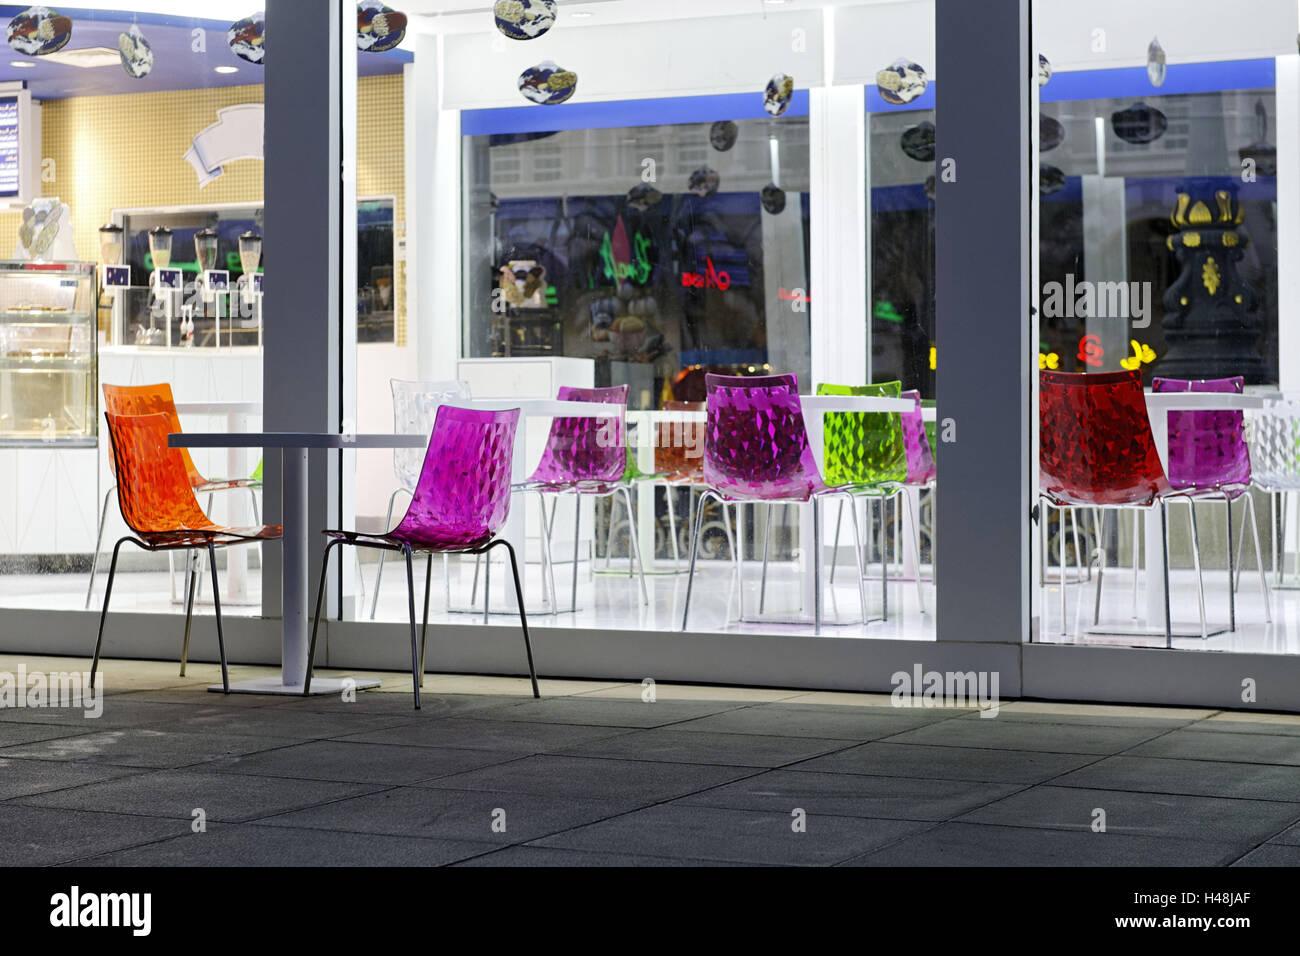 Ice Cream Parlour With Colourful Plastic Chairs, Al Qasba, Emirate Of  Sharjah, United Arab Emirates, Arabian Peninsula, The Middle East, Asia,